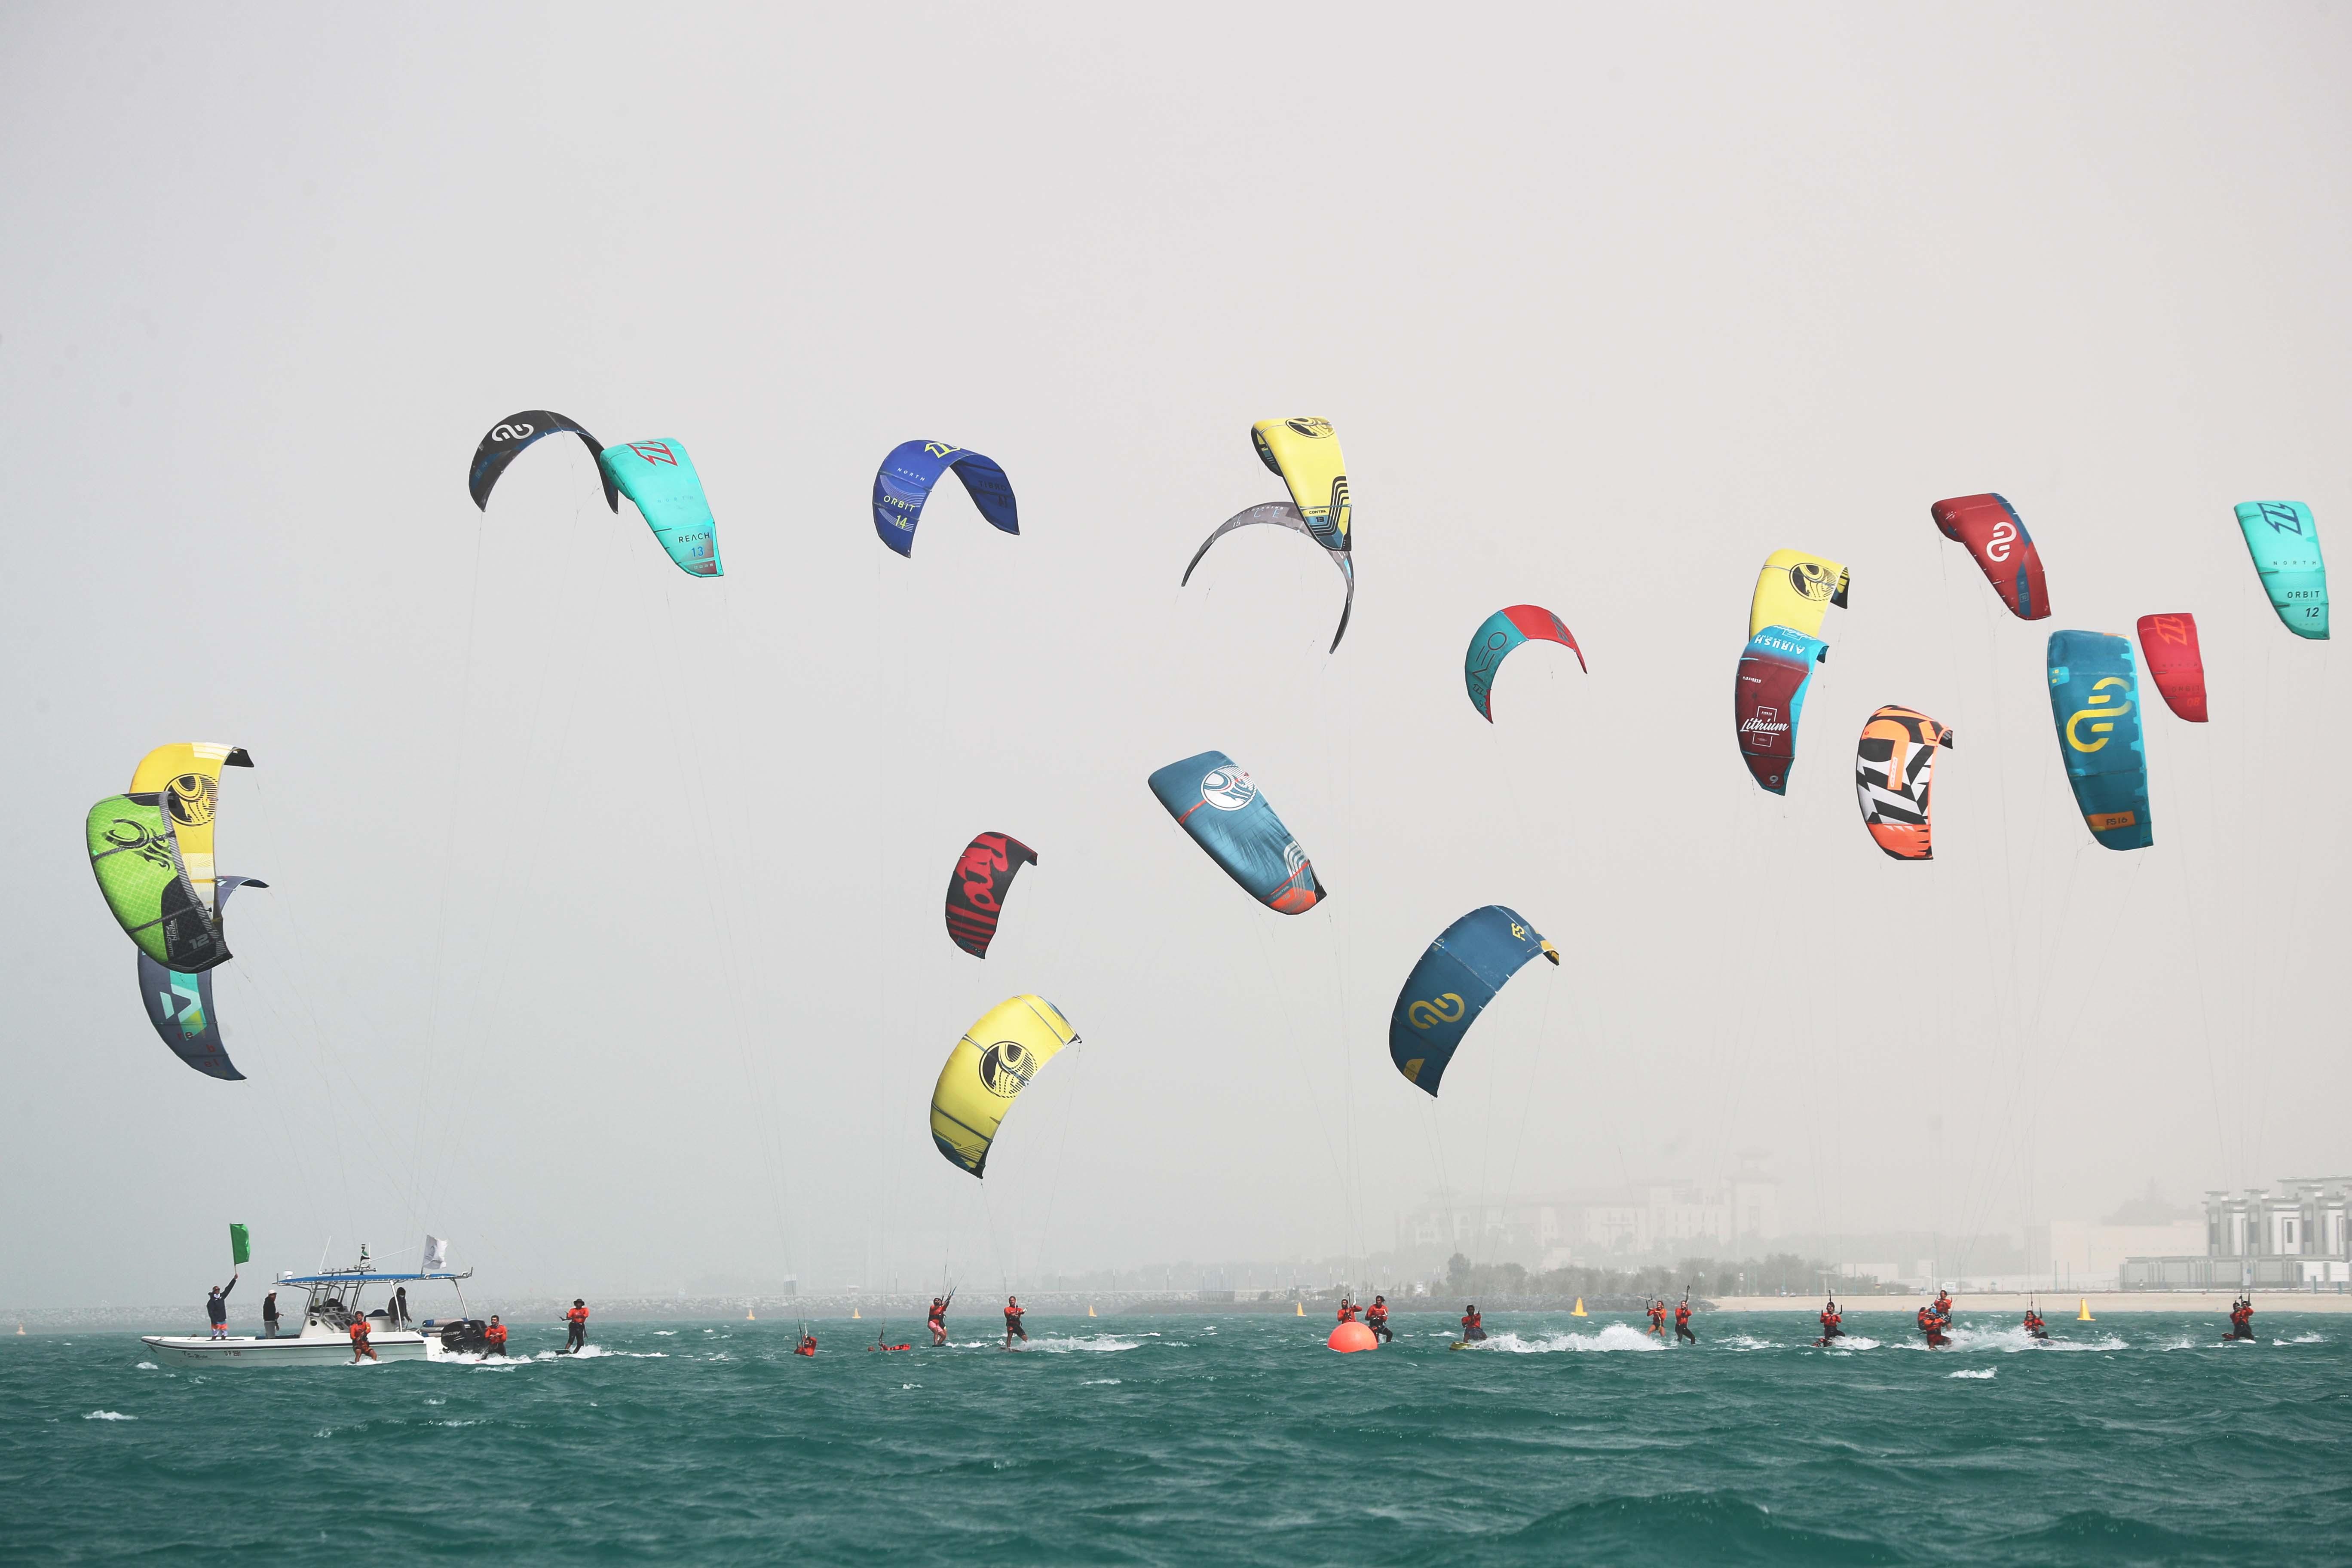 Al Mansoori and Al Falasi are the stars of Dubai Kitesurf Open